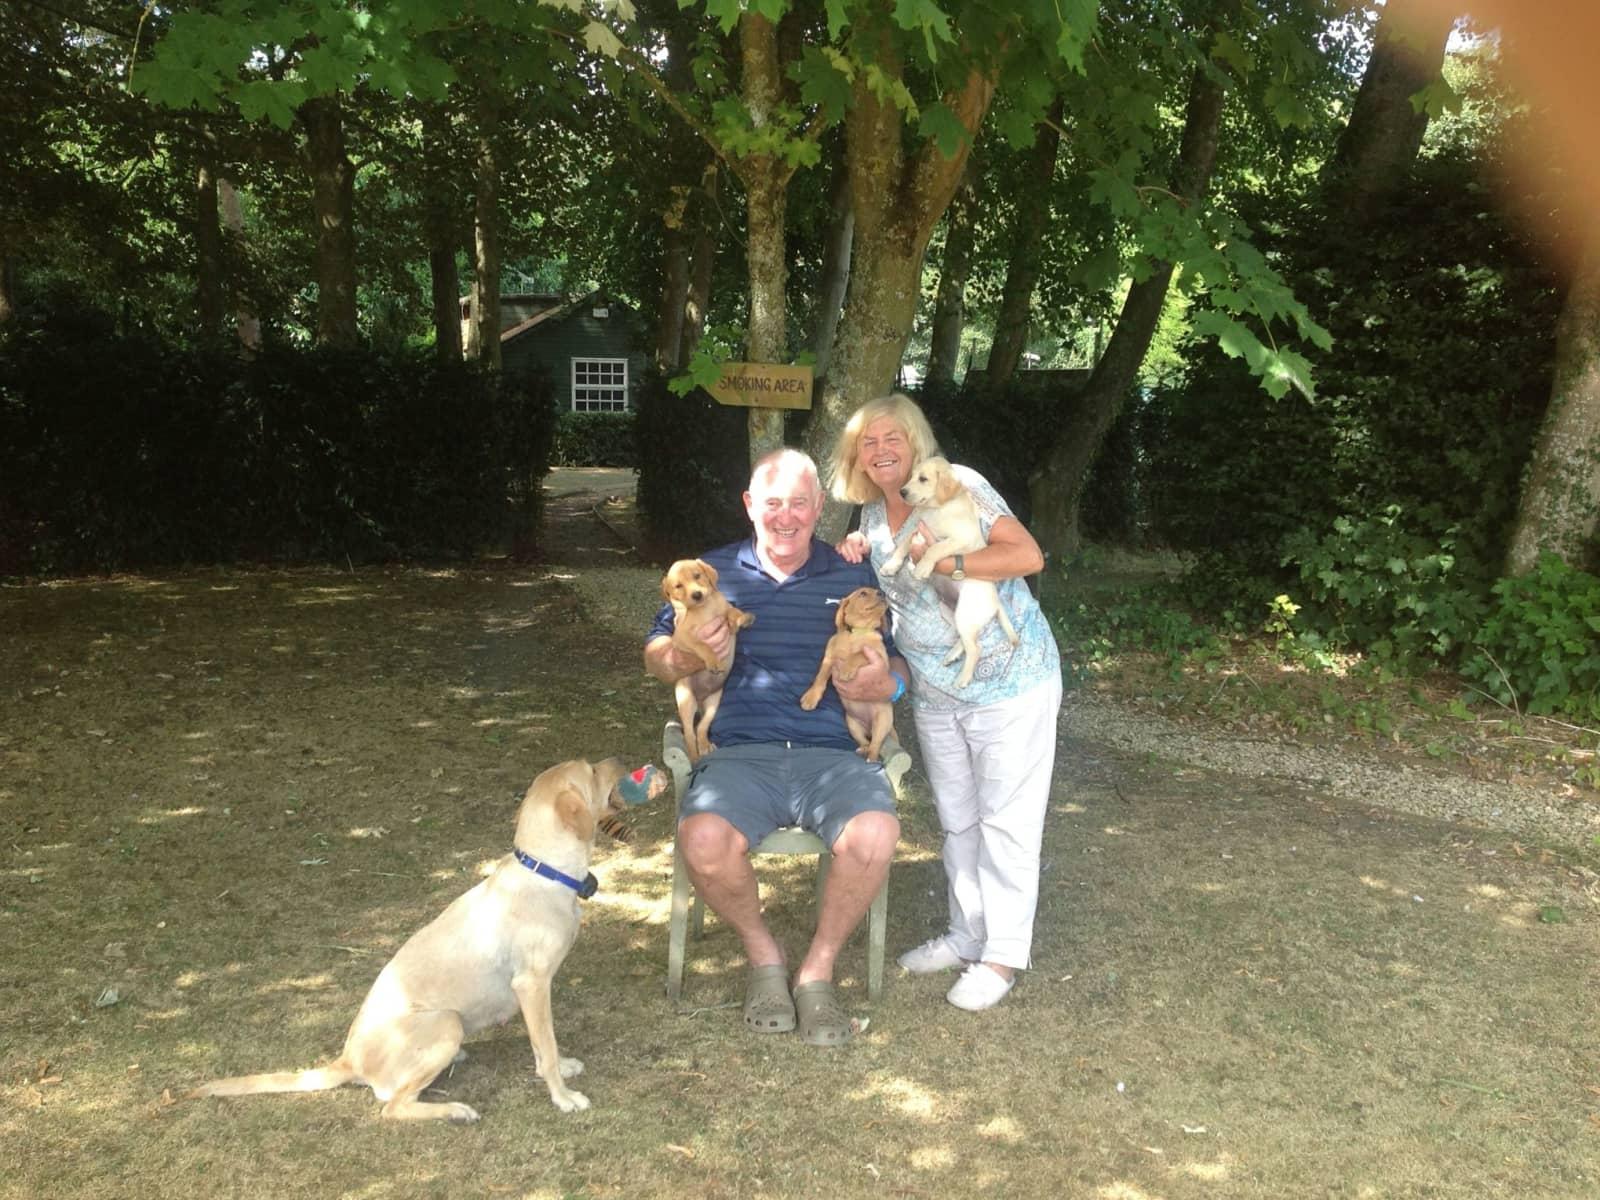 Peter & Hilda from Morpeth, United Kingdom